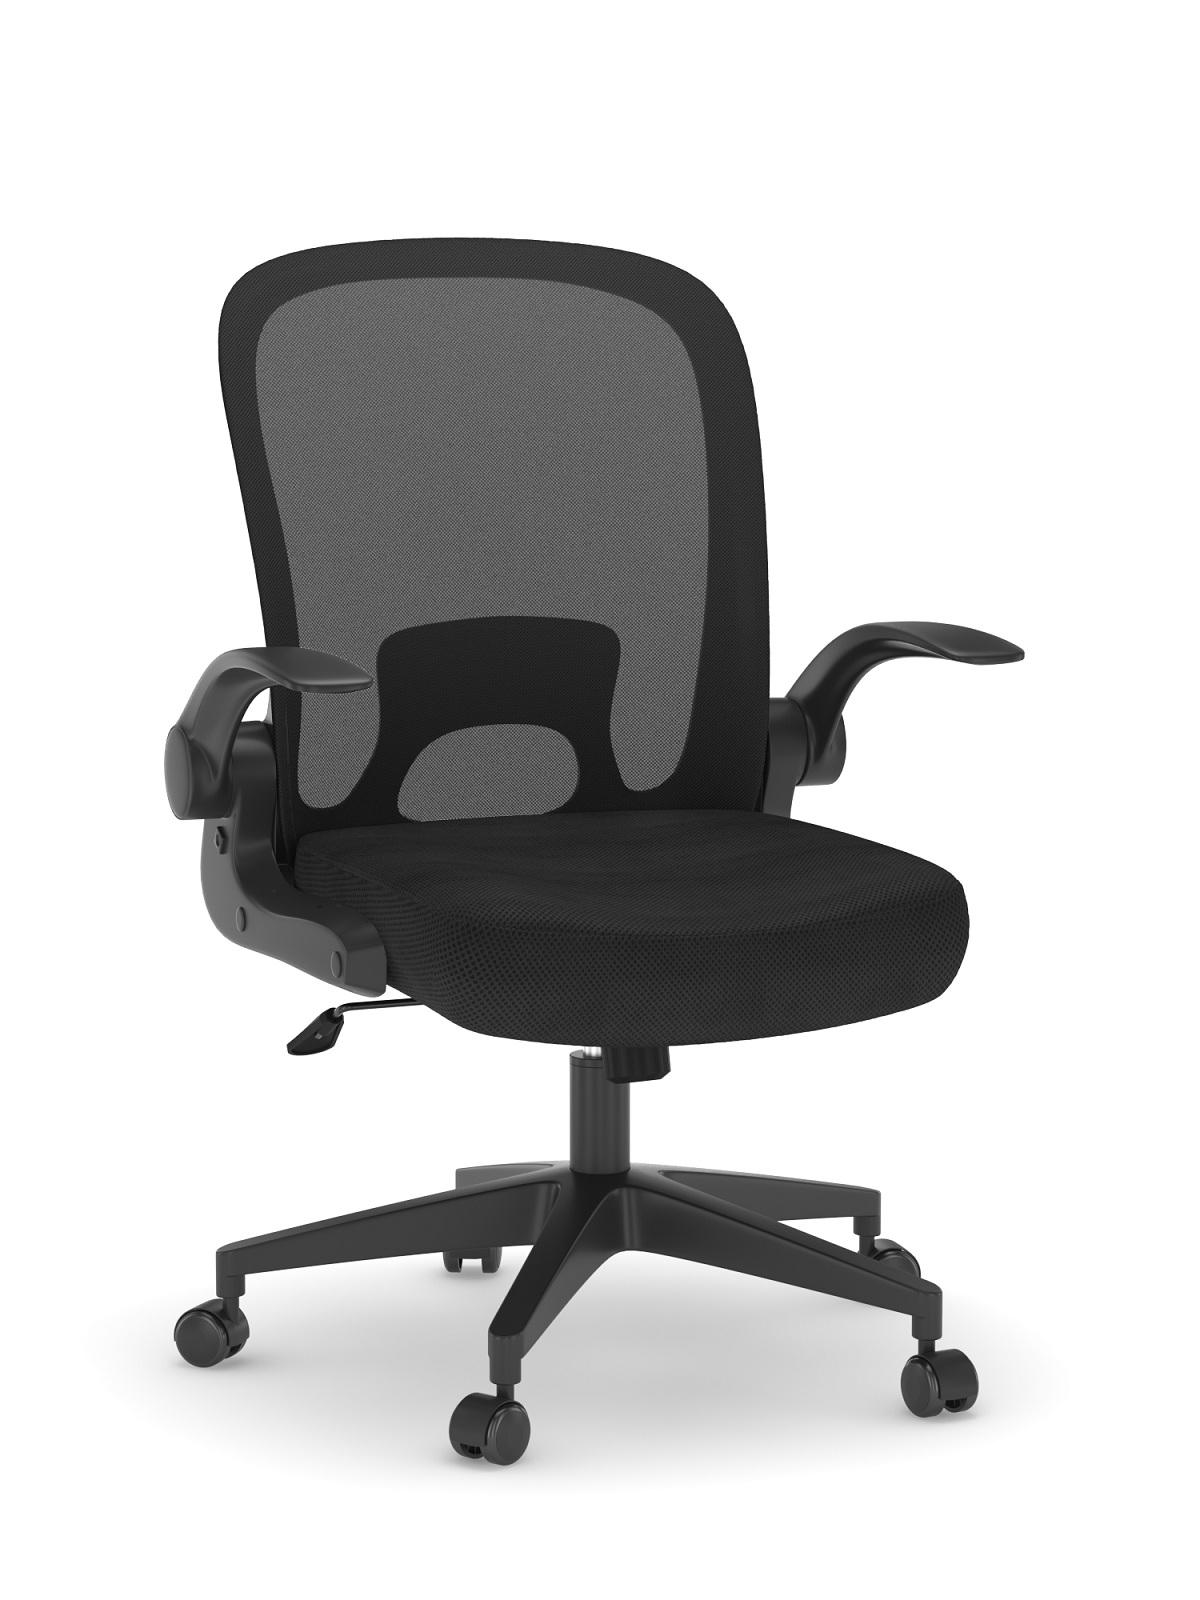 Офисное кресло Loftyhome Template black VC6007 B